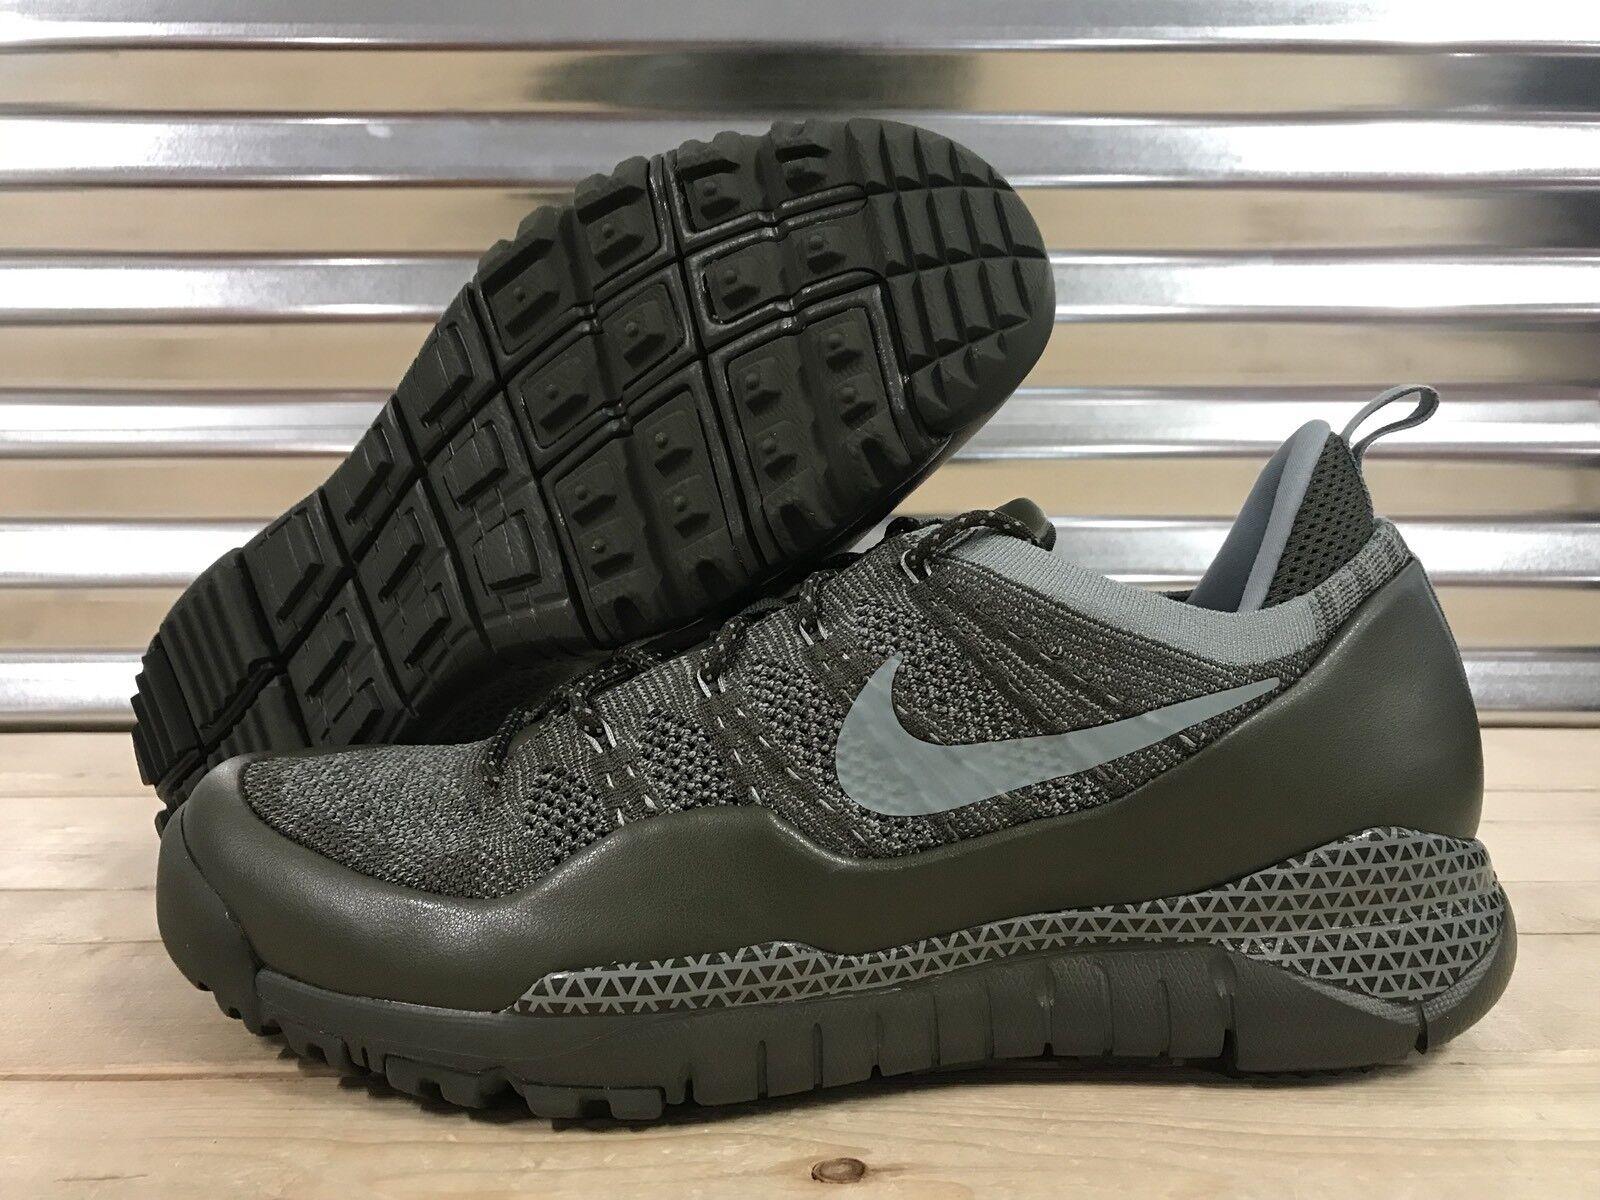 13858e642ee1 Nike Lupinek Flyknit Low Shoes Cargo Khaki Mica Green SZ 11 ( 882685-300 )